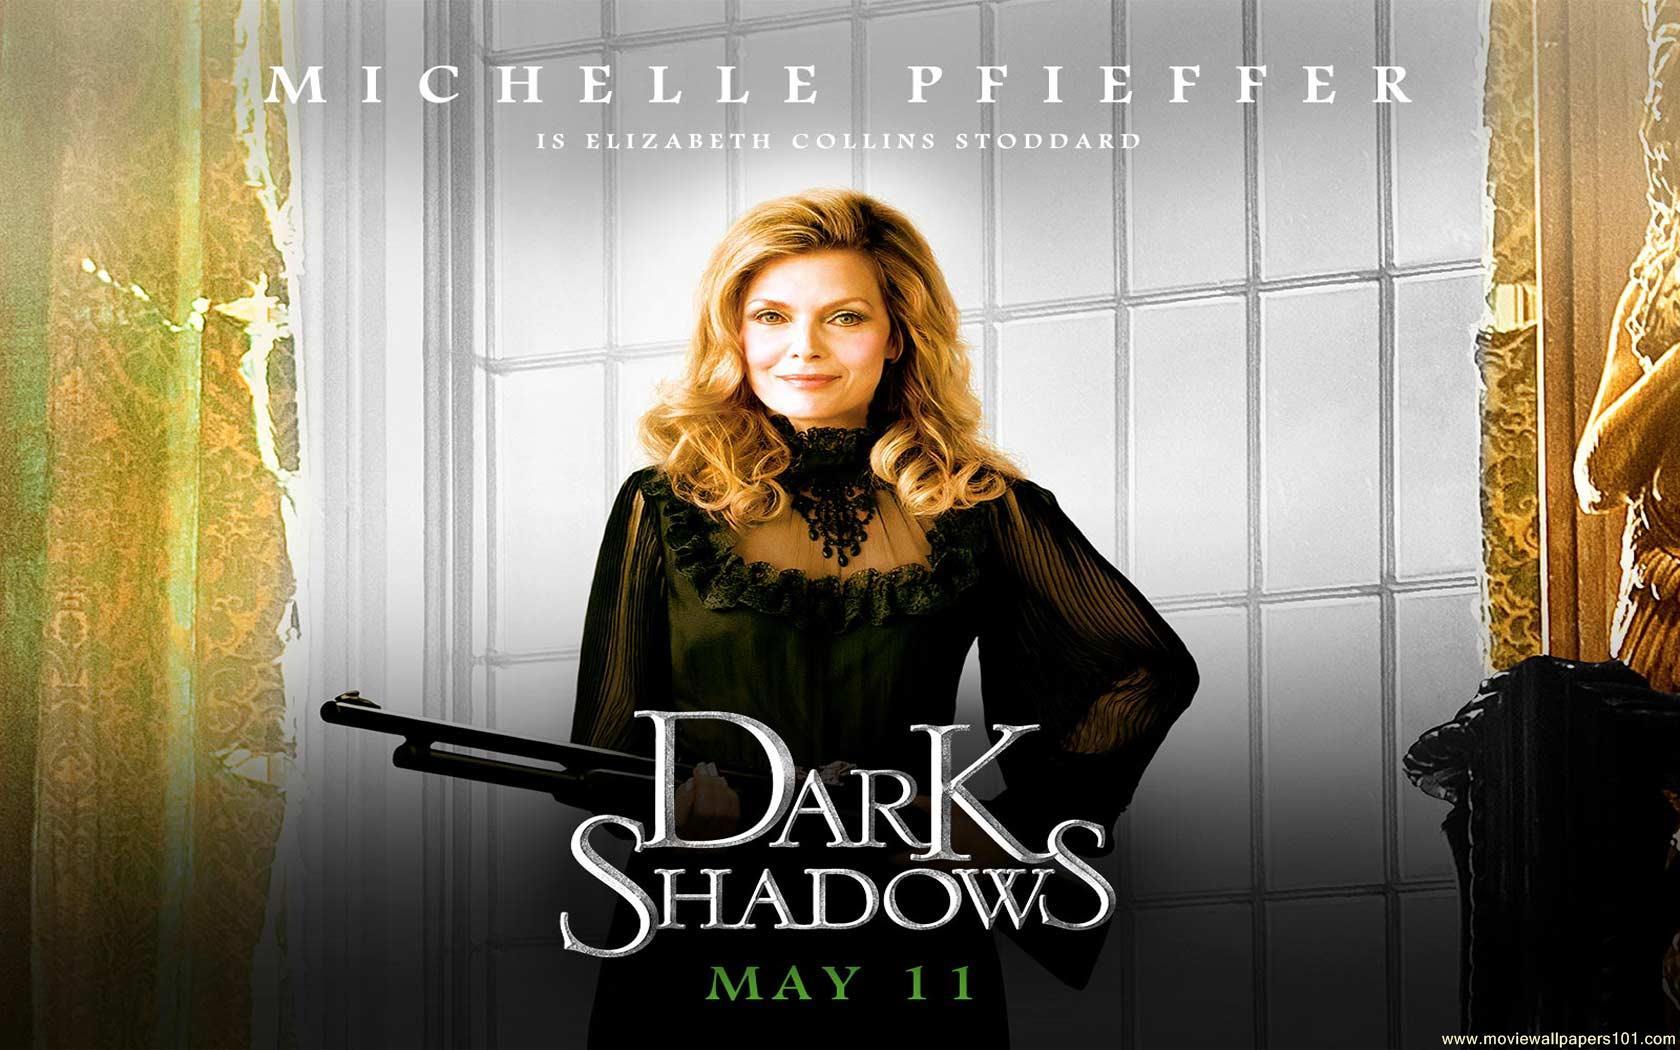 Dark Shadows wallpaper   1680x1050 MovieWallpapers101com 1680x1050